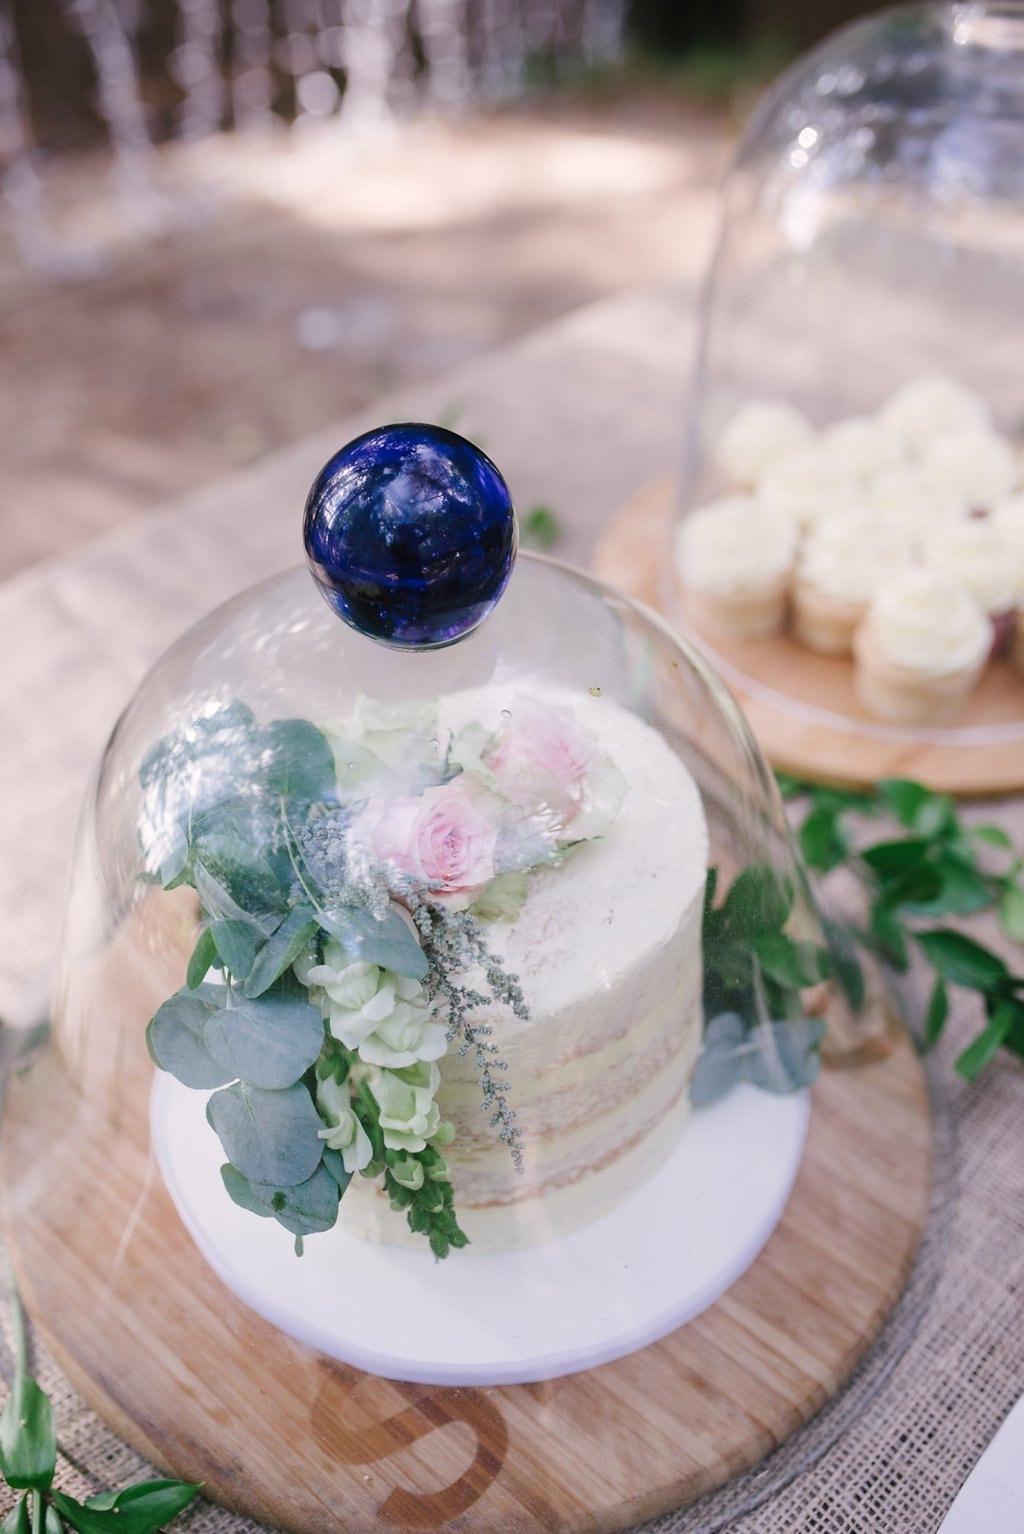 Naked Cake Under Glass Dome | Image: Cheryl McEwan